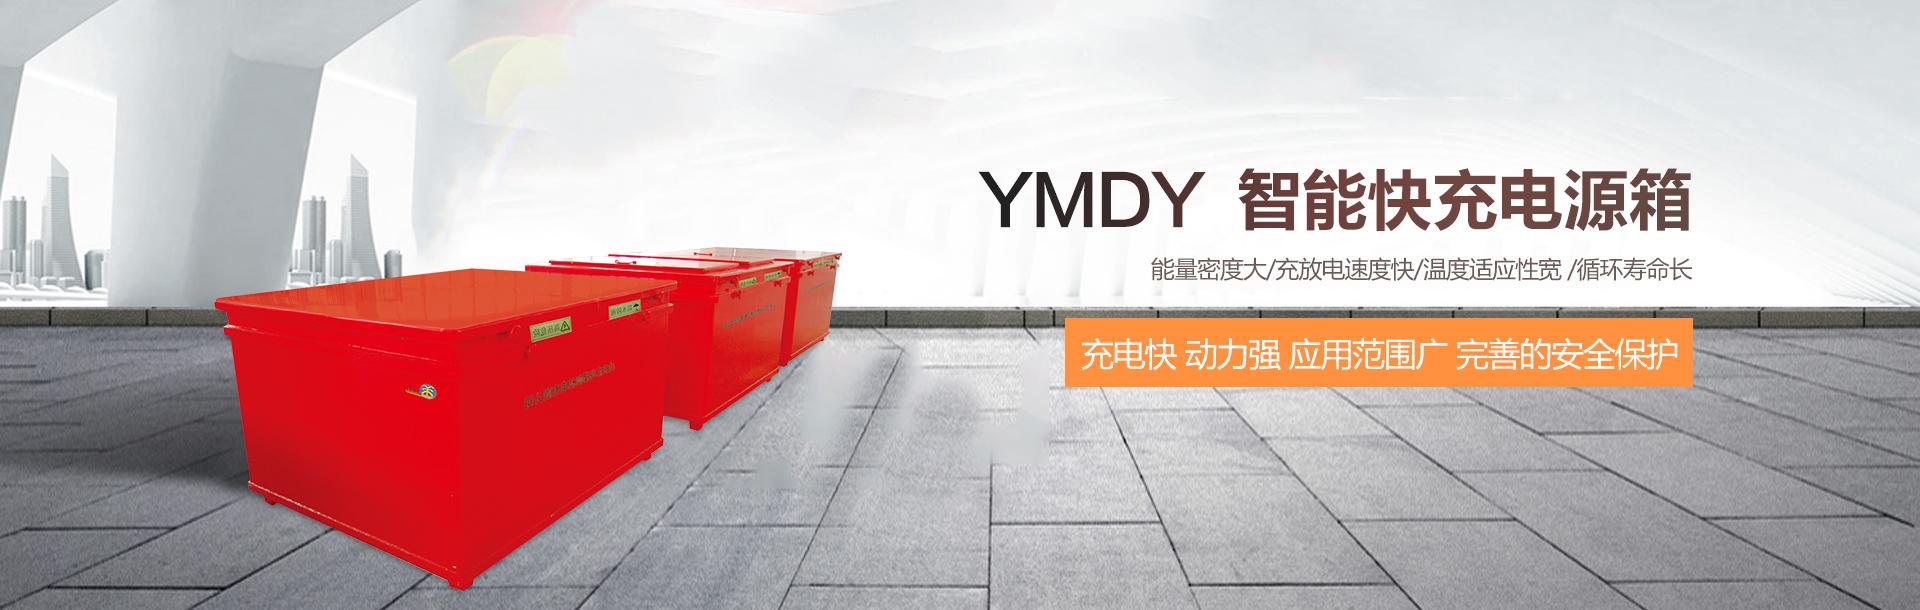 YMDY智能快充电源箱